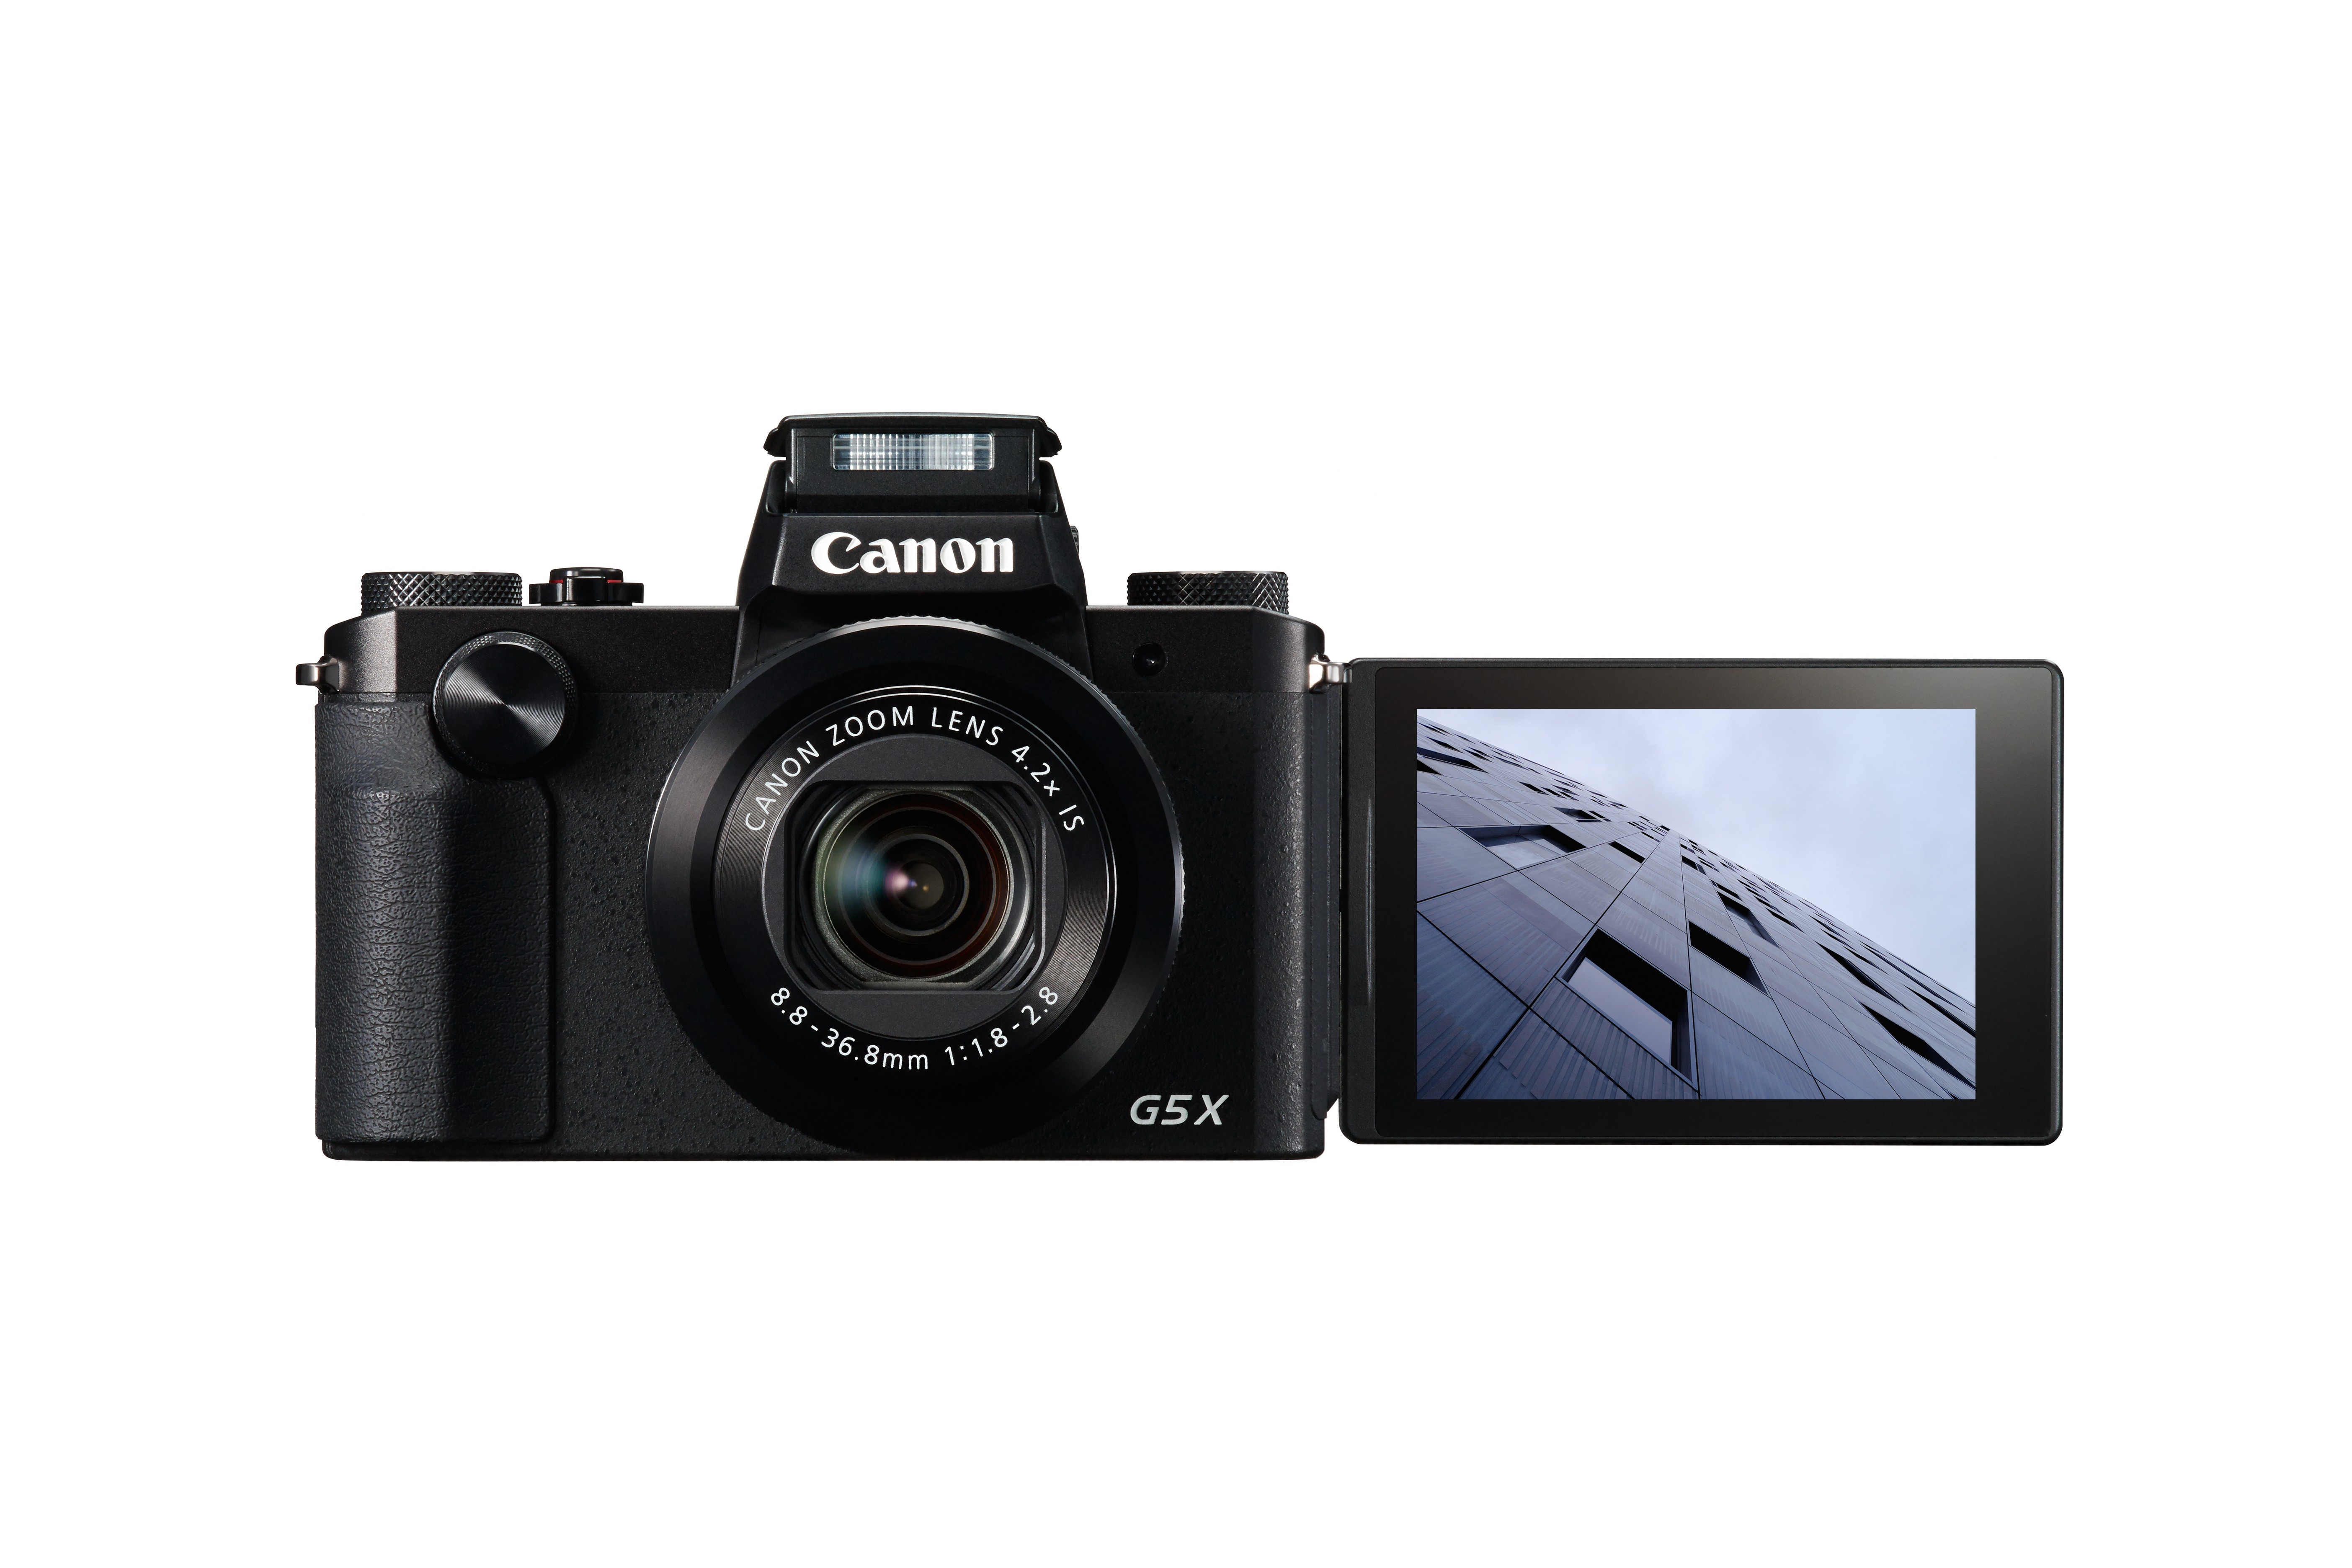 4b012daba3f18e Salon de la Photo — Fin 2015   quel compact expert choisir   - Les ...